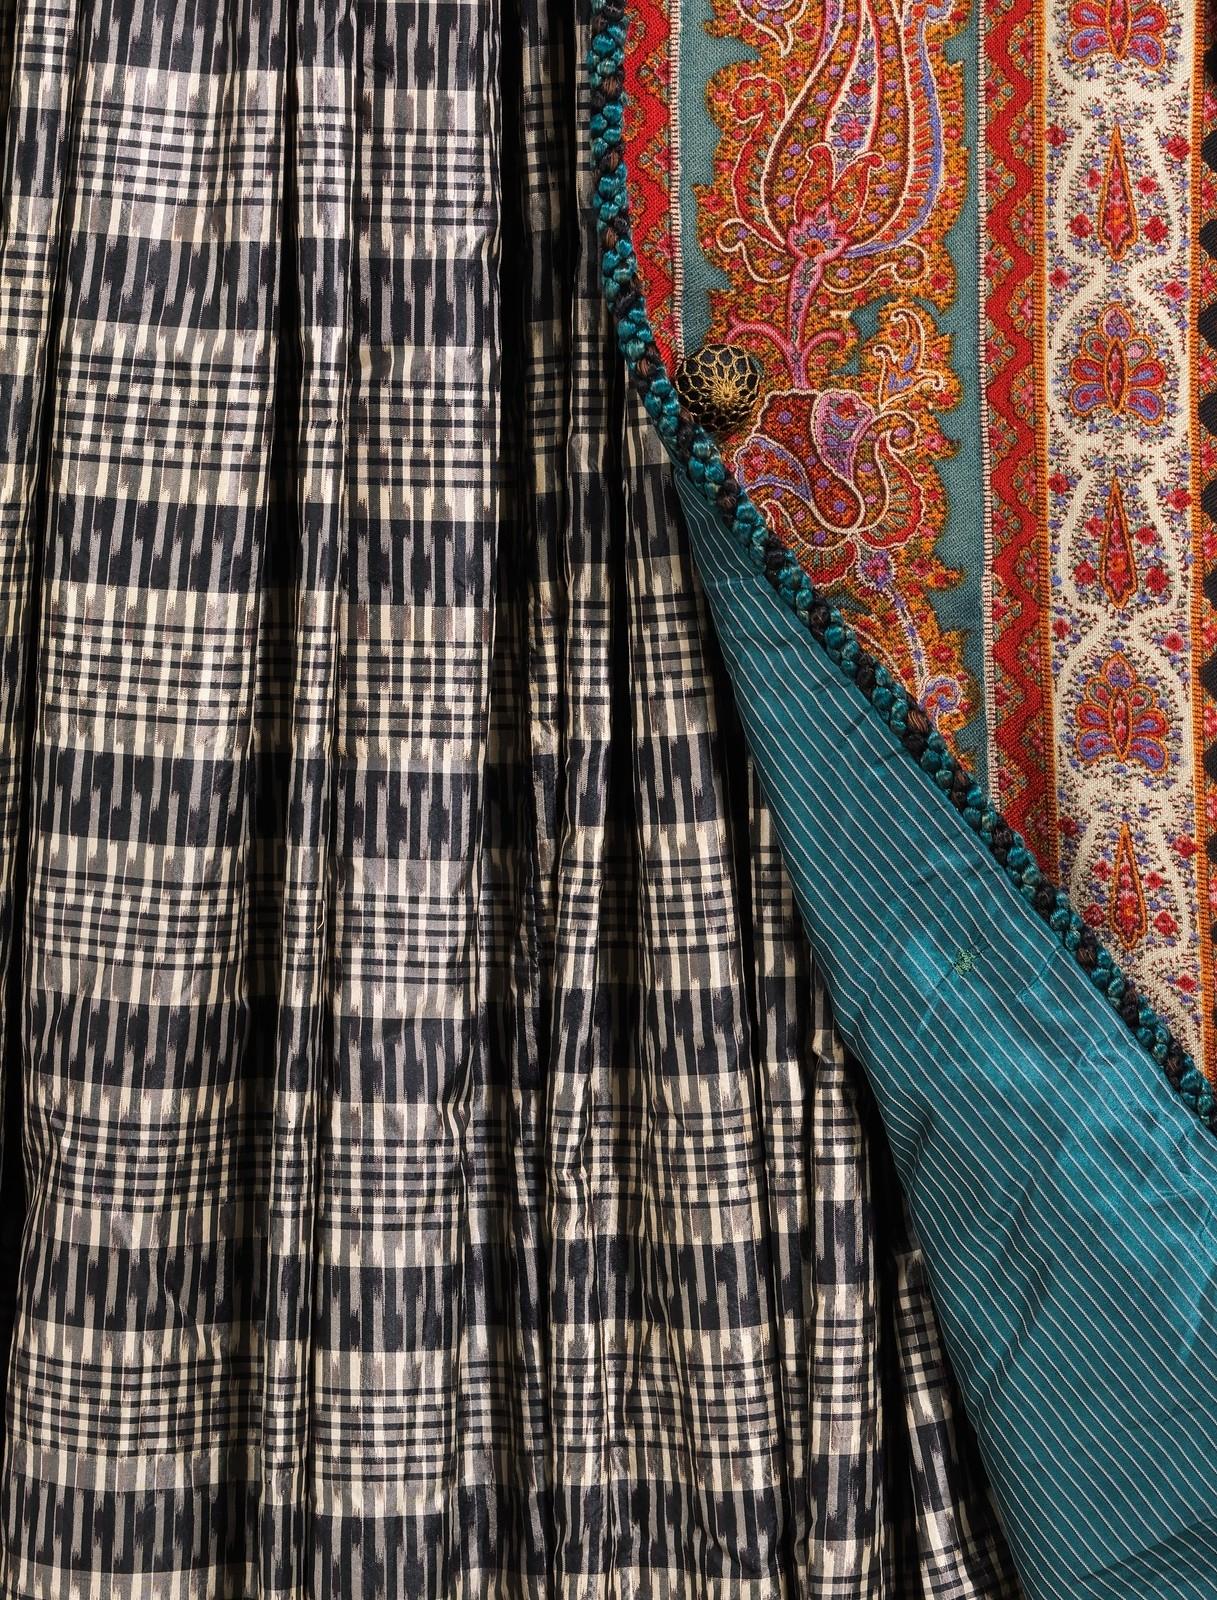 Dressing gown ca. 1875 American Wool, silk, metmuseum (detail showing lining)